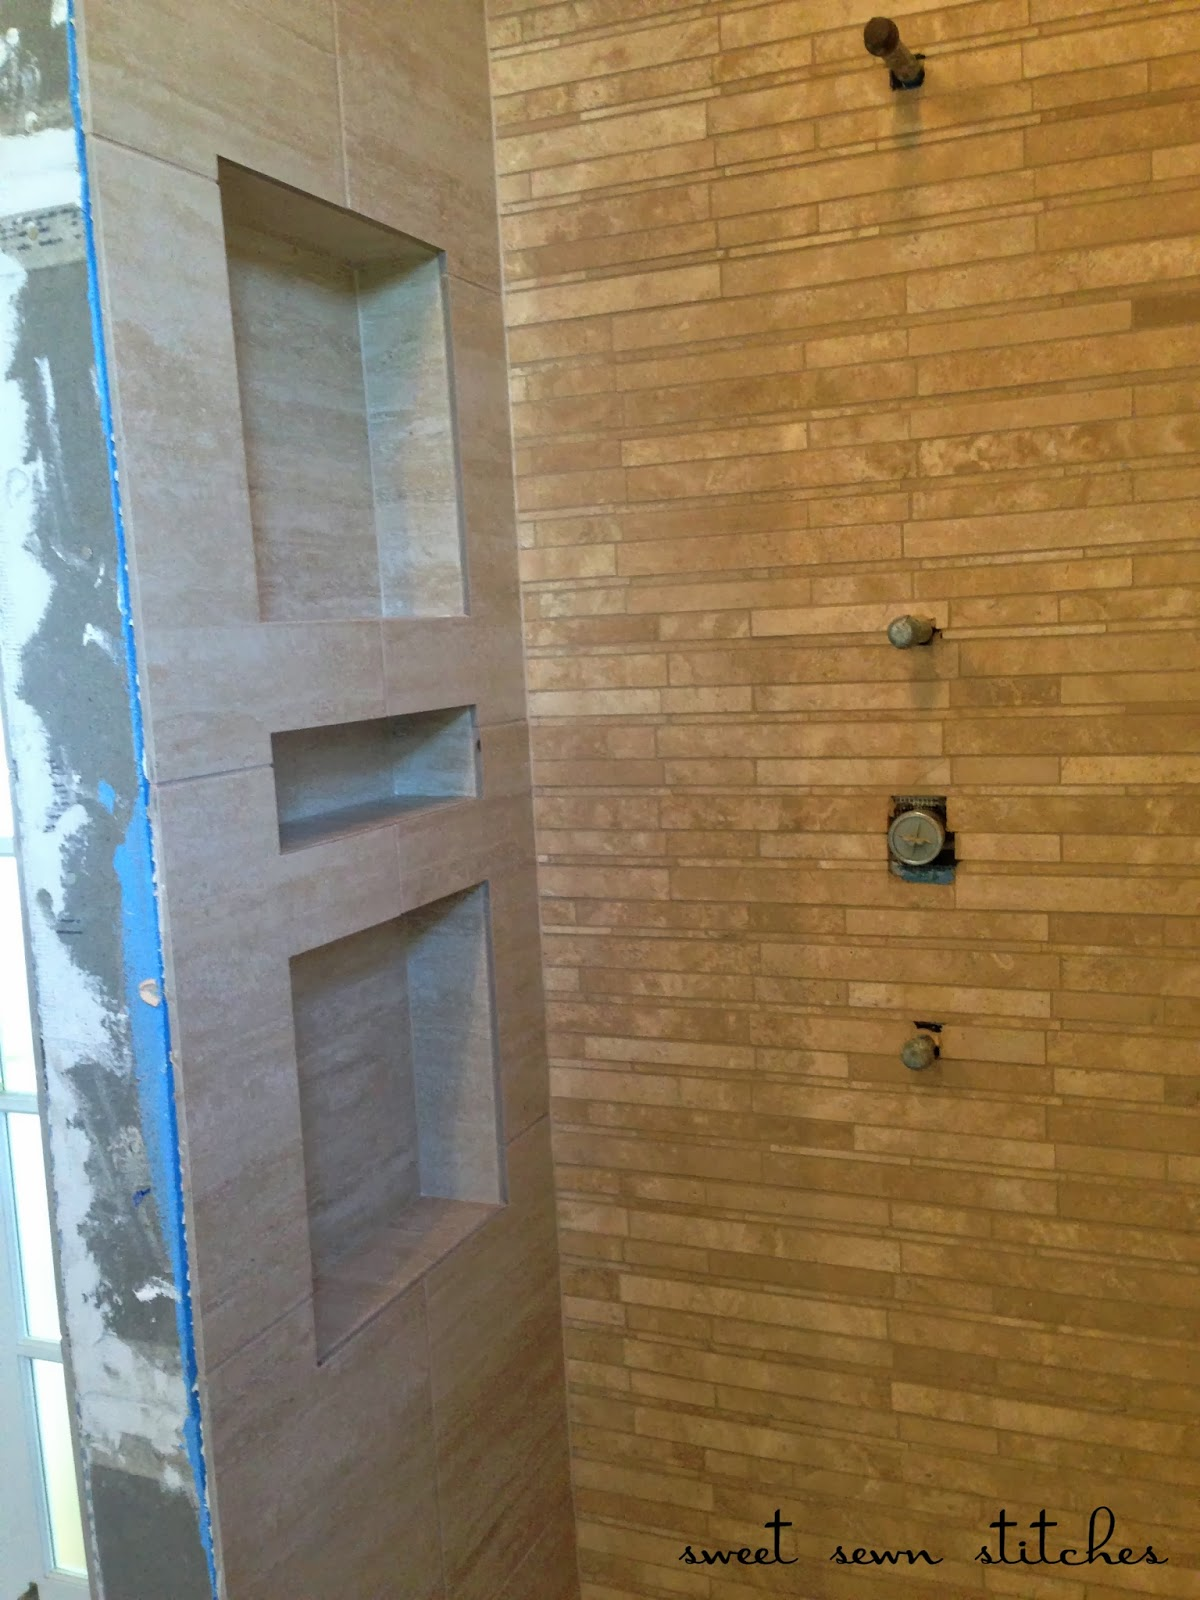 Sweet Sewn Stitches Bath Shower Reno Part 3